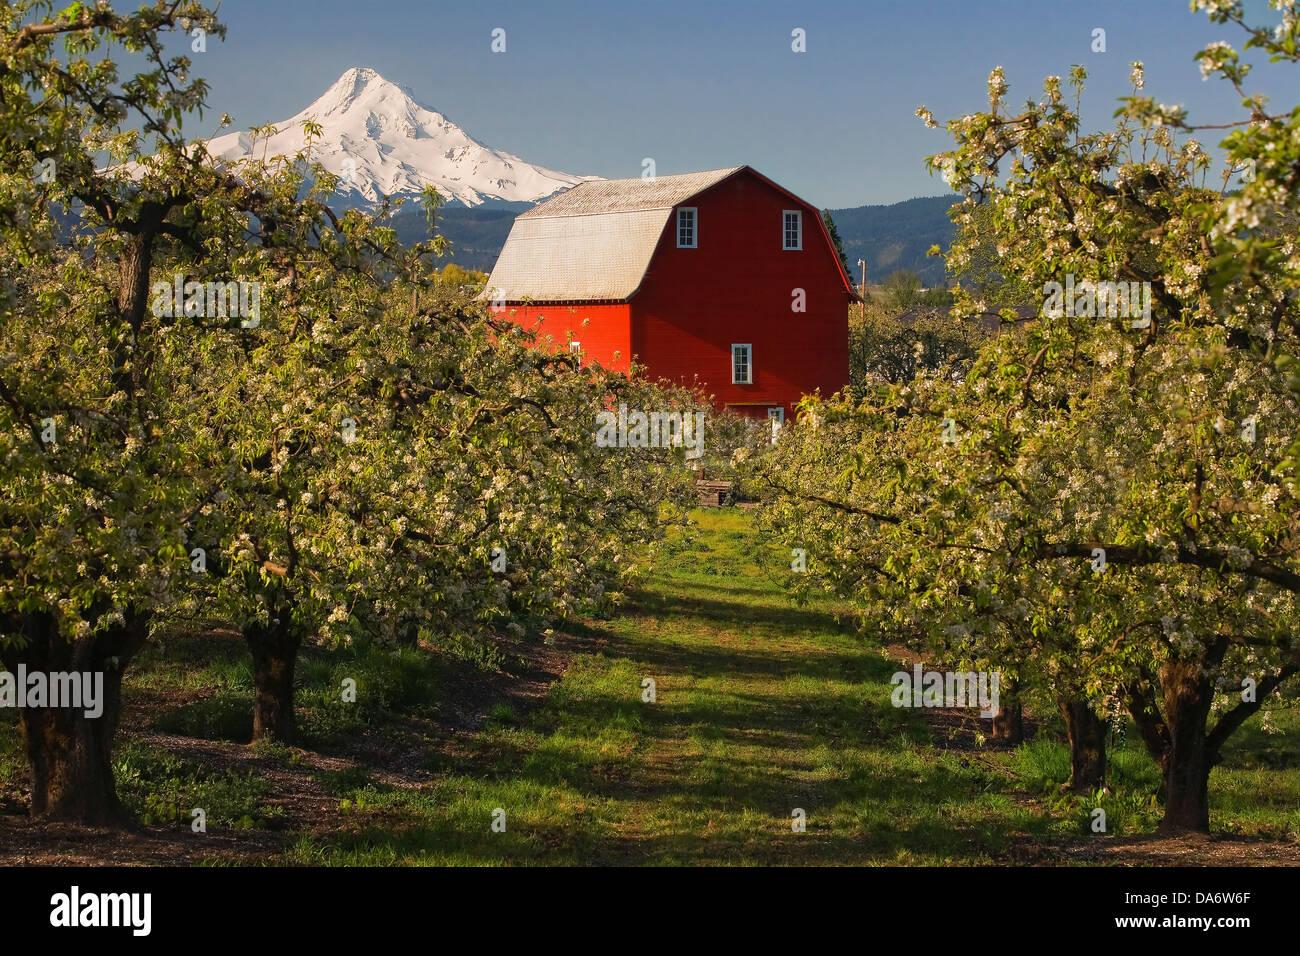 United States Farms